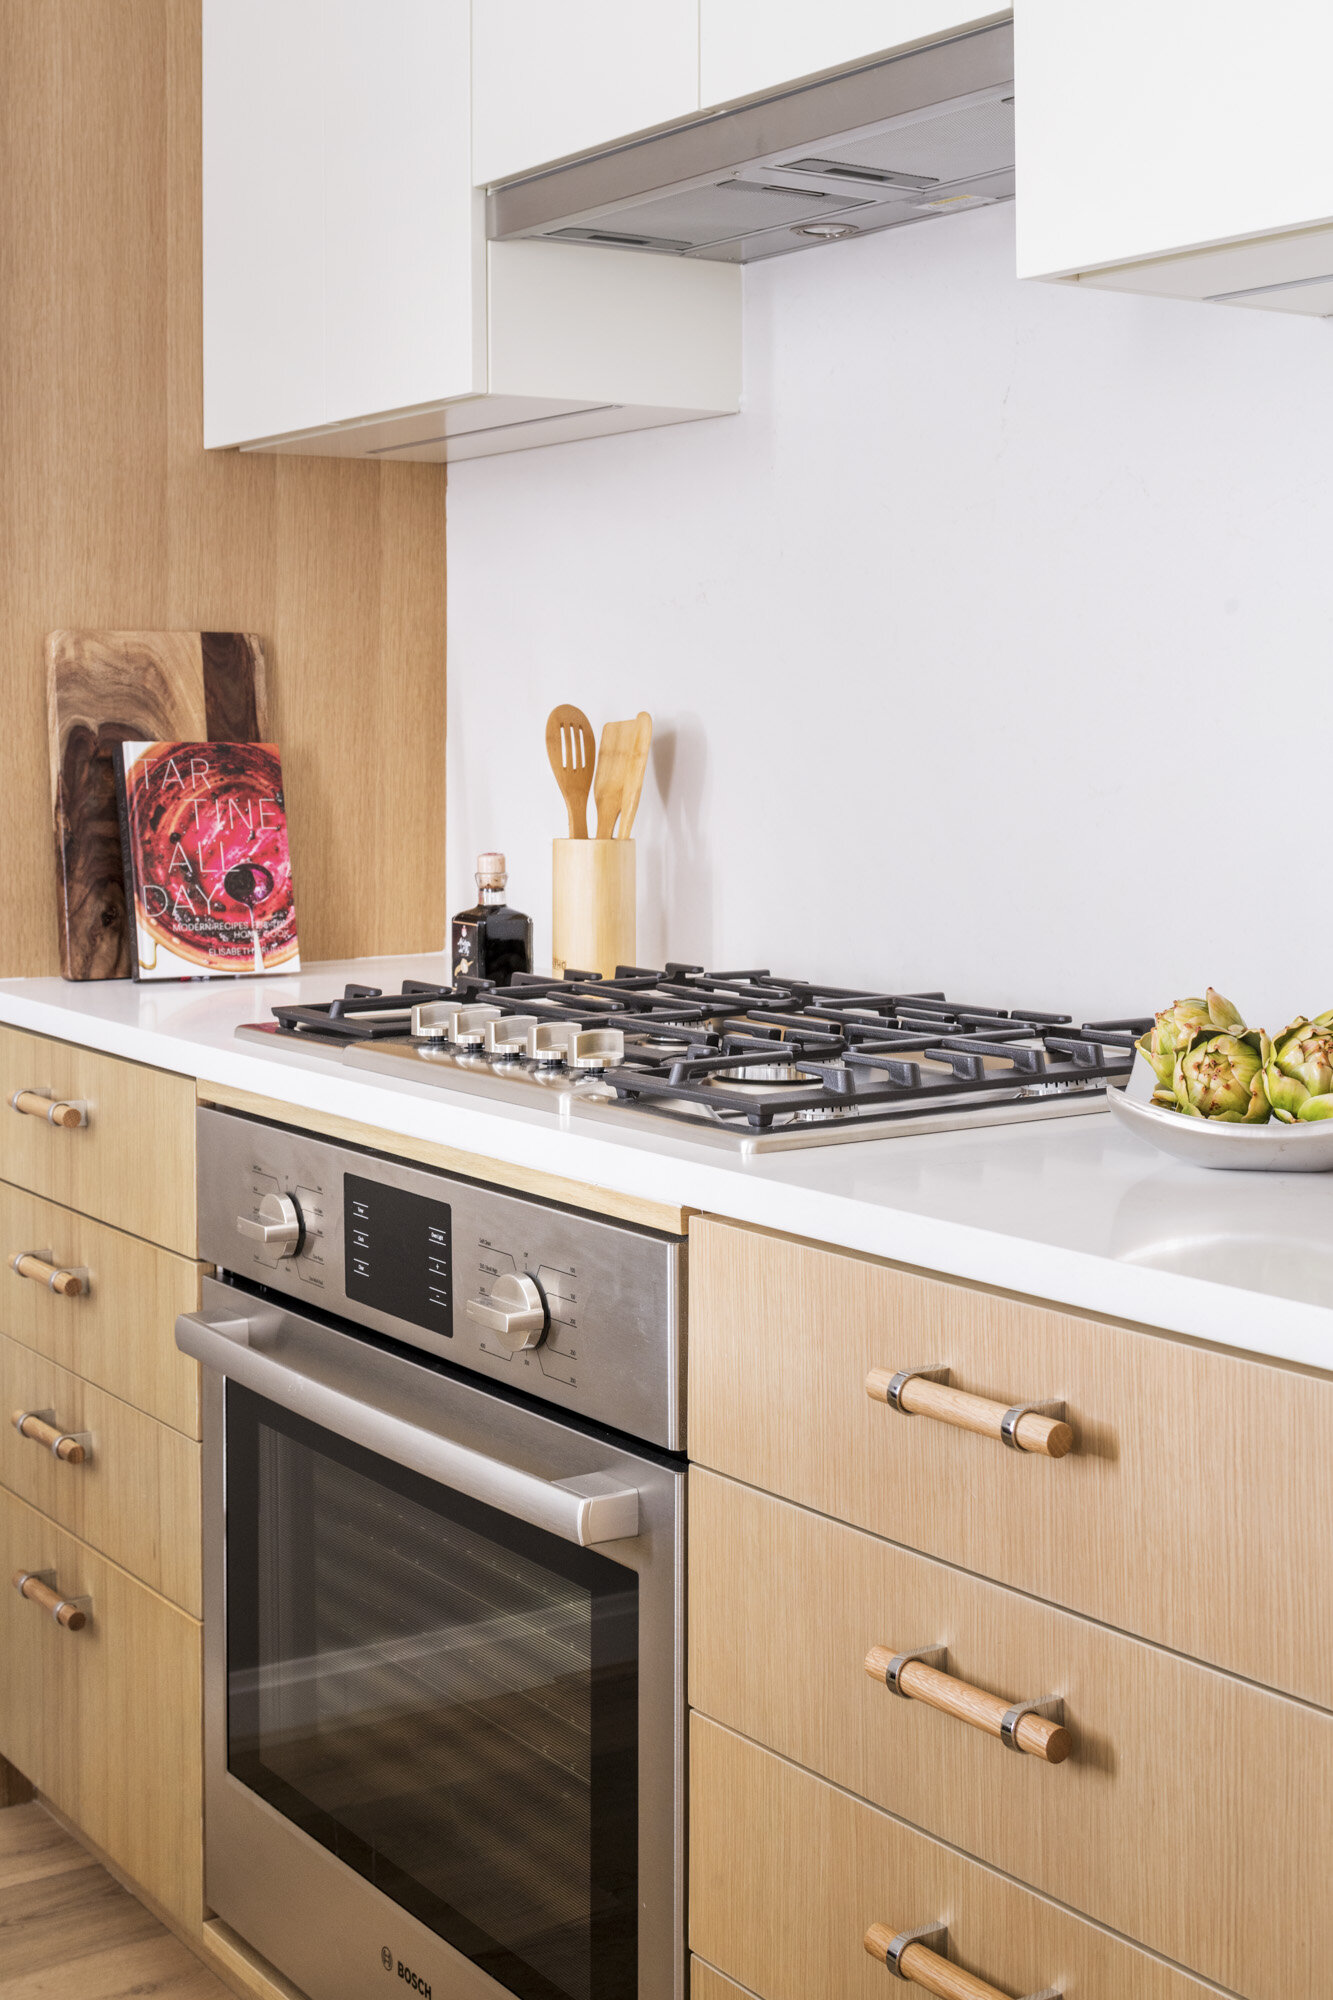 Galerie 3 bedroom kitchen detail.jpg